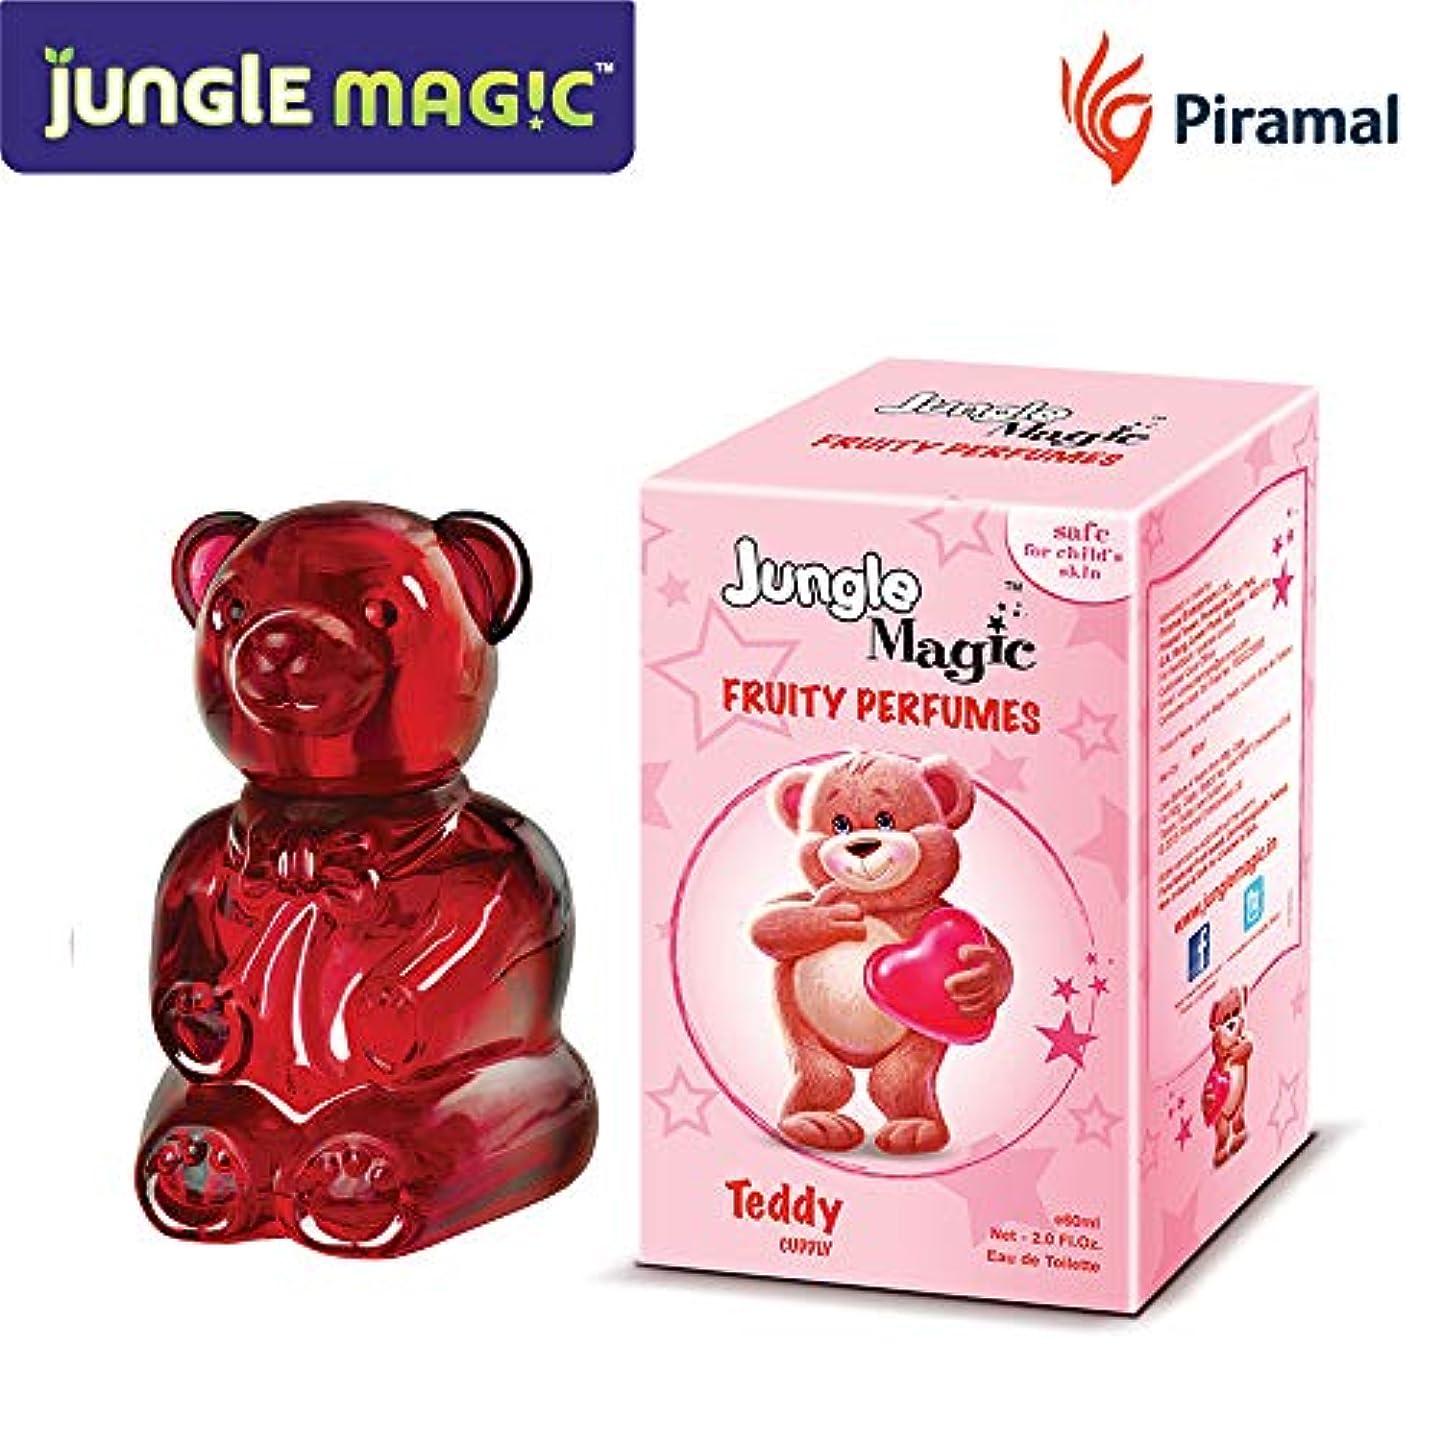 模倣圧倒的隙間Jungle Magic Cuddly Teddy Fruity Perfume, 60ml